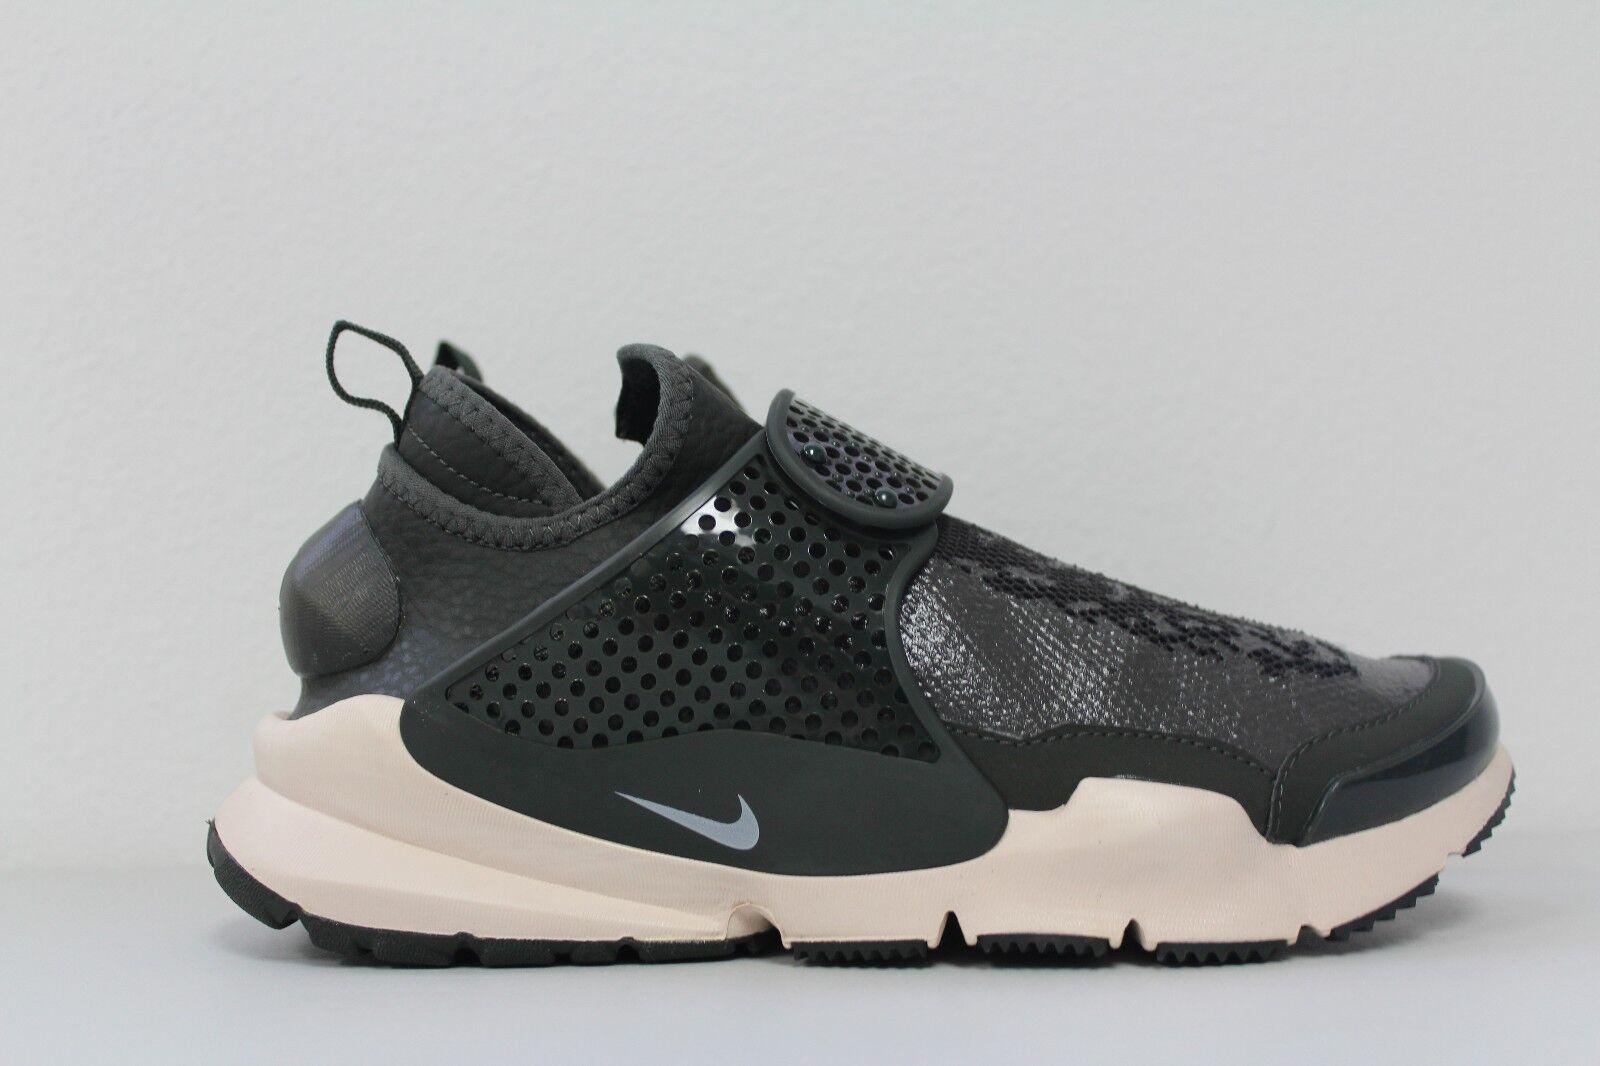 Nike Mens Nike x Stone Island Sock Dart Mid Sequoia LT Orewood 910090 300 Size 6